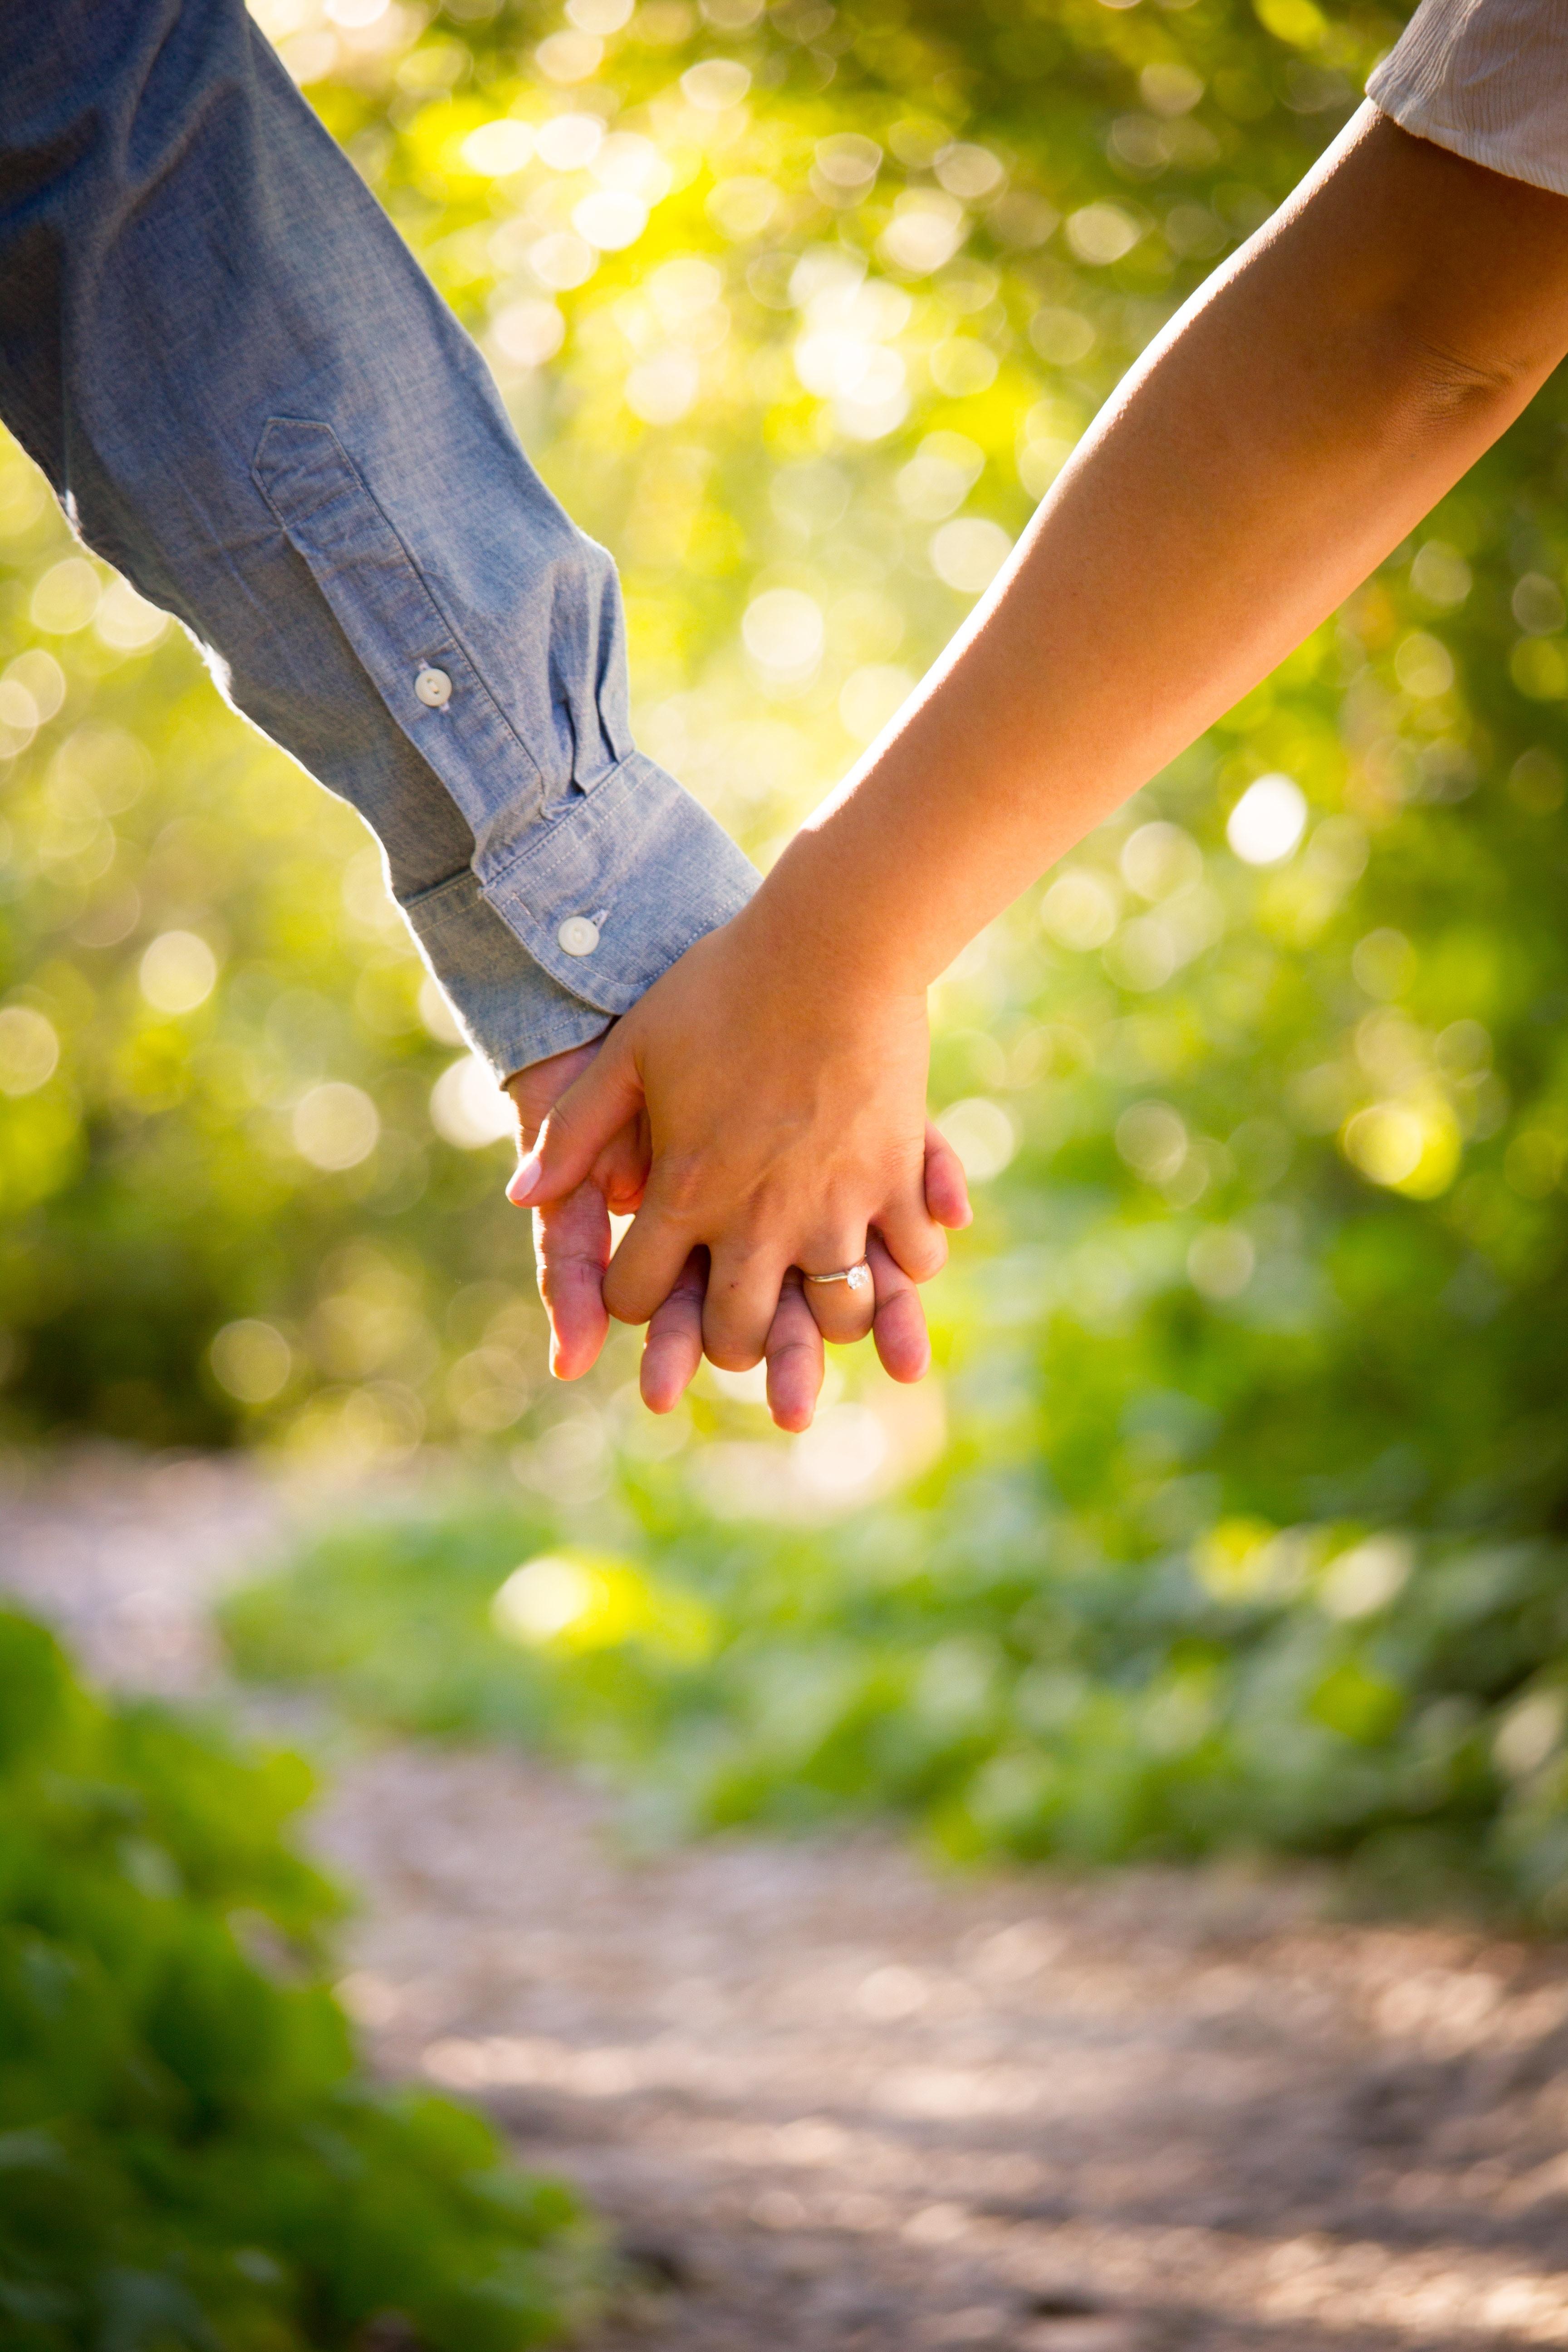 Vinculo e Relacionamento